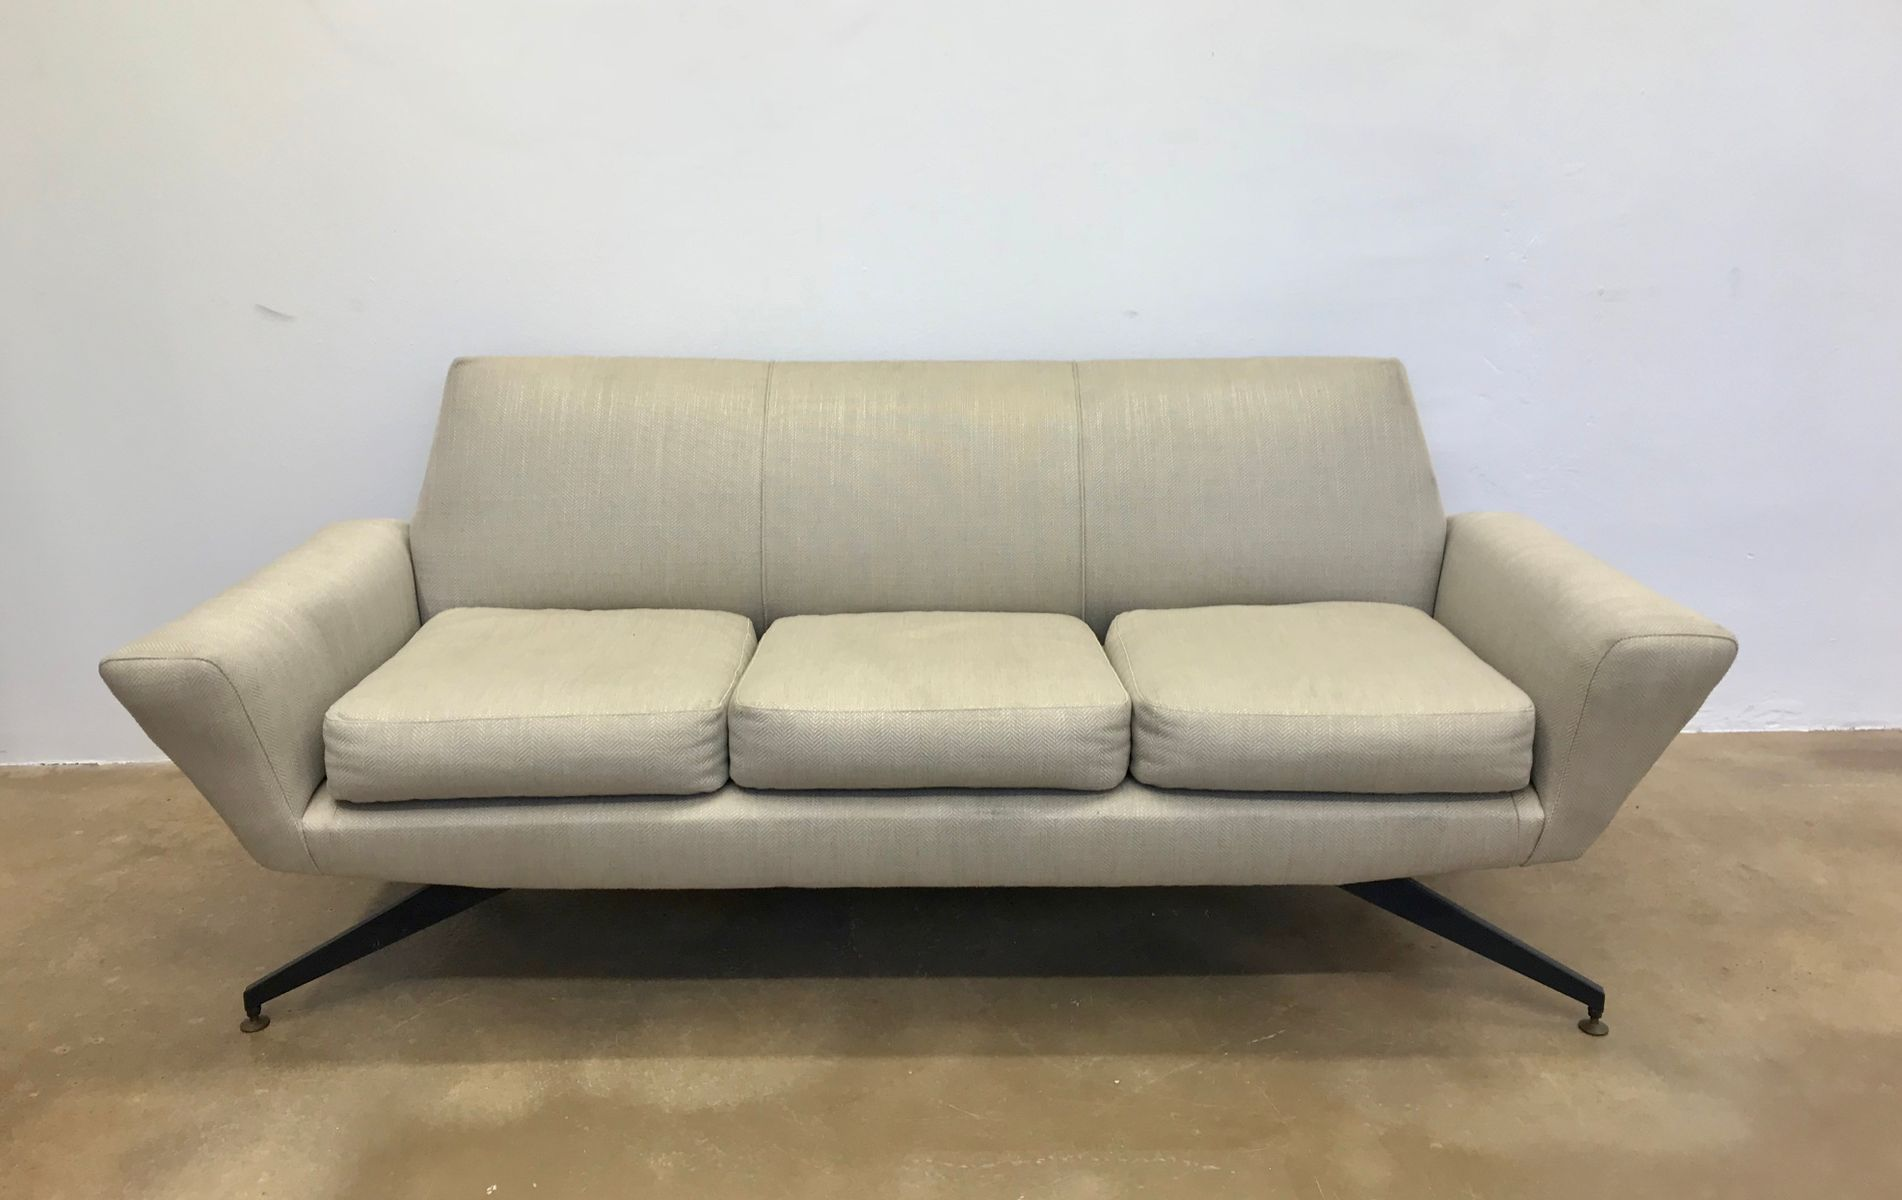 Italienisches Sofa von Lenzi, 1950er